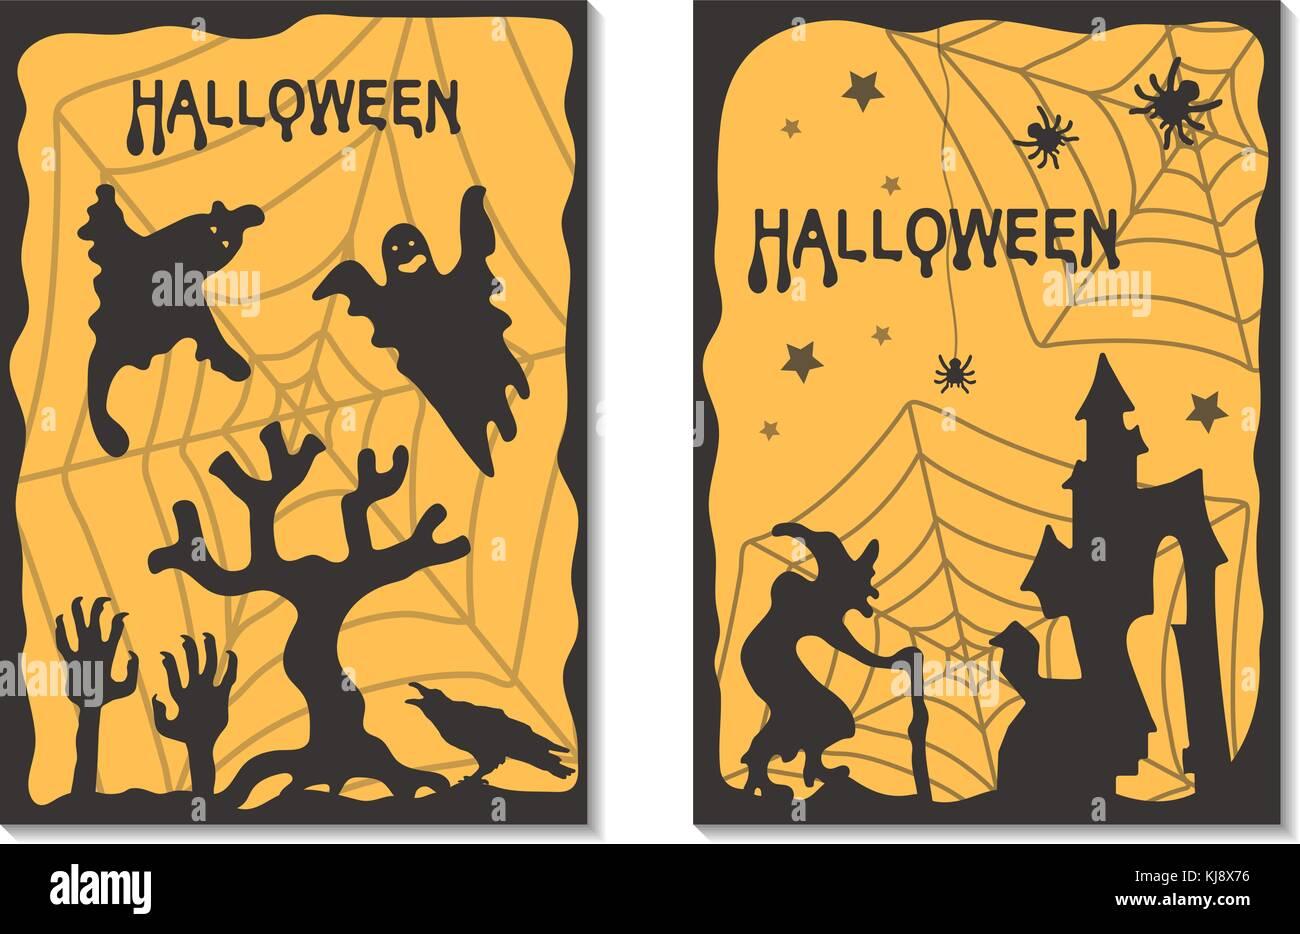 Halloween cards. Vector illustration - Stock Image